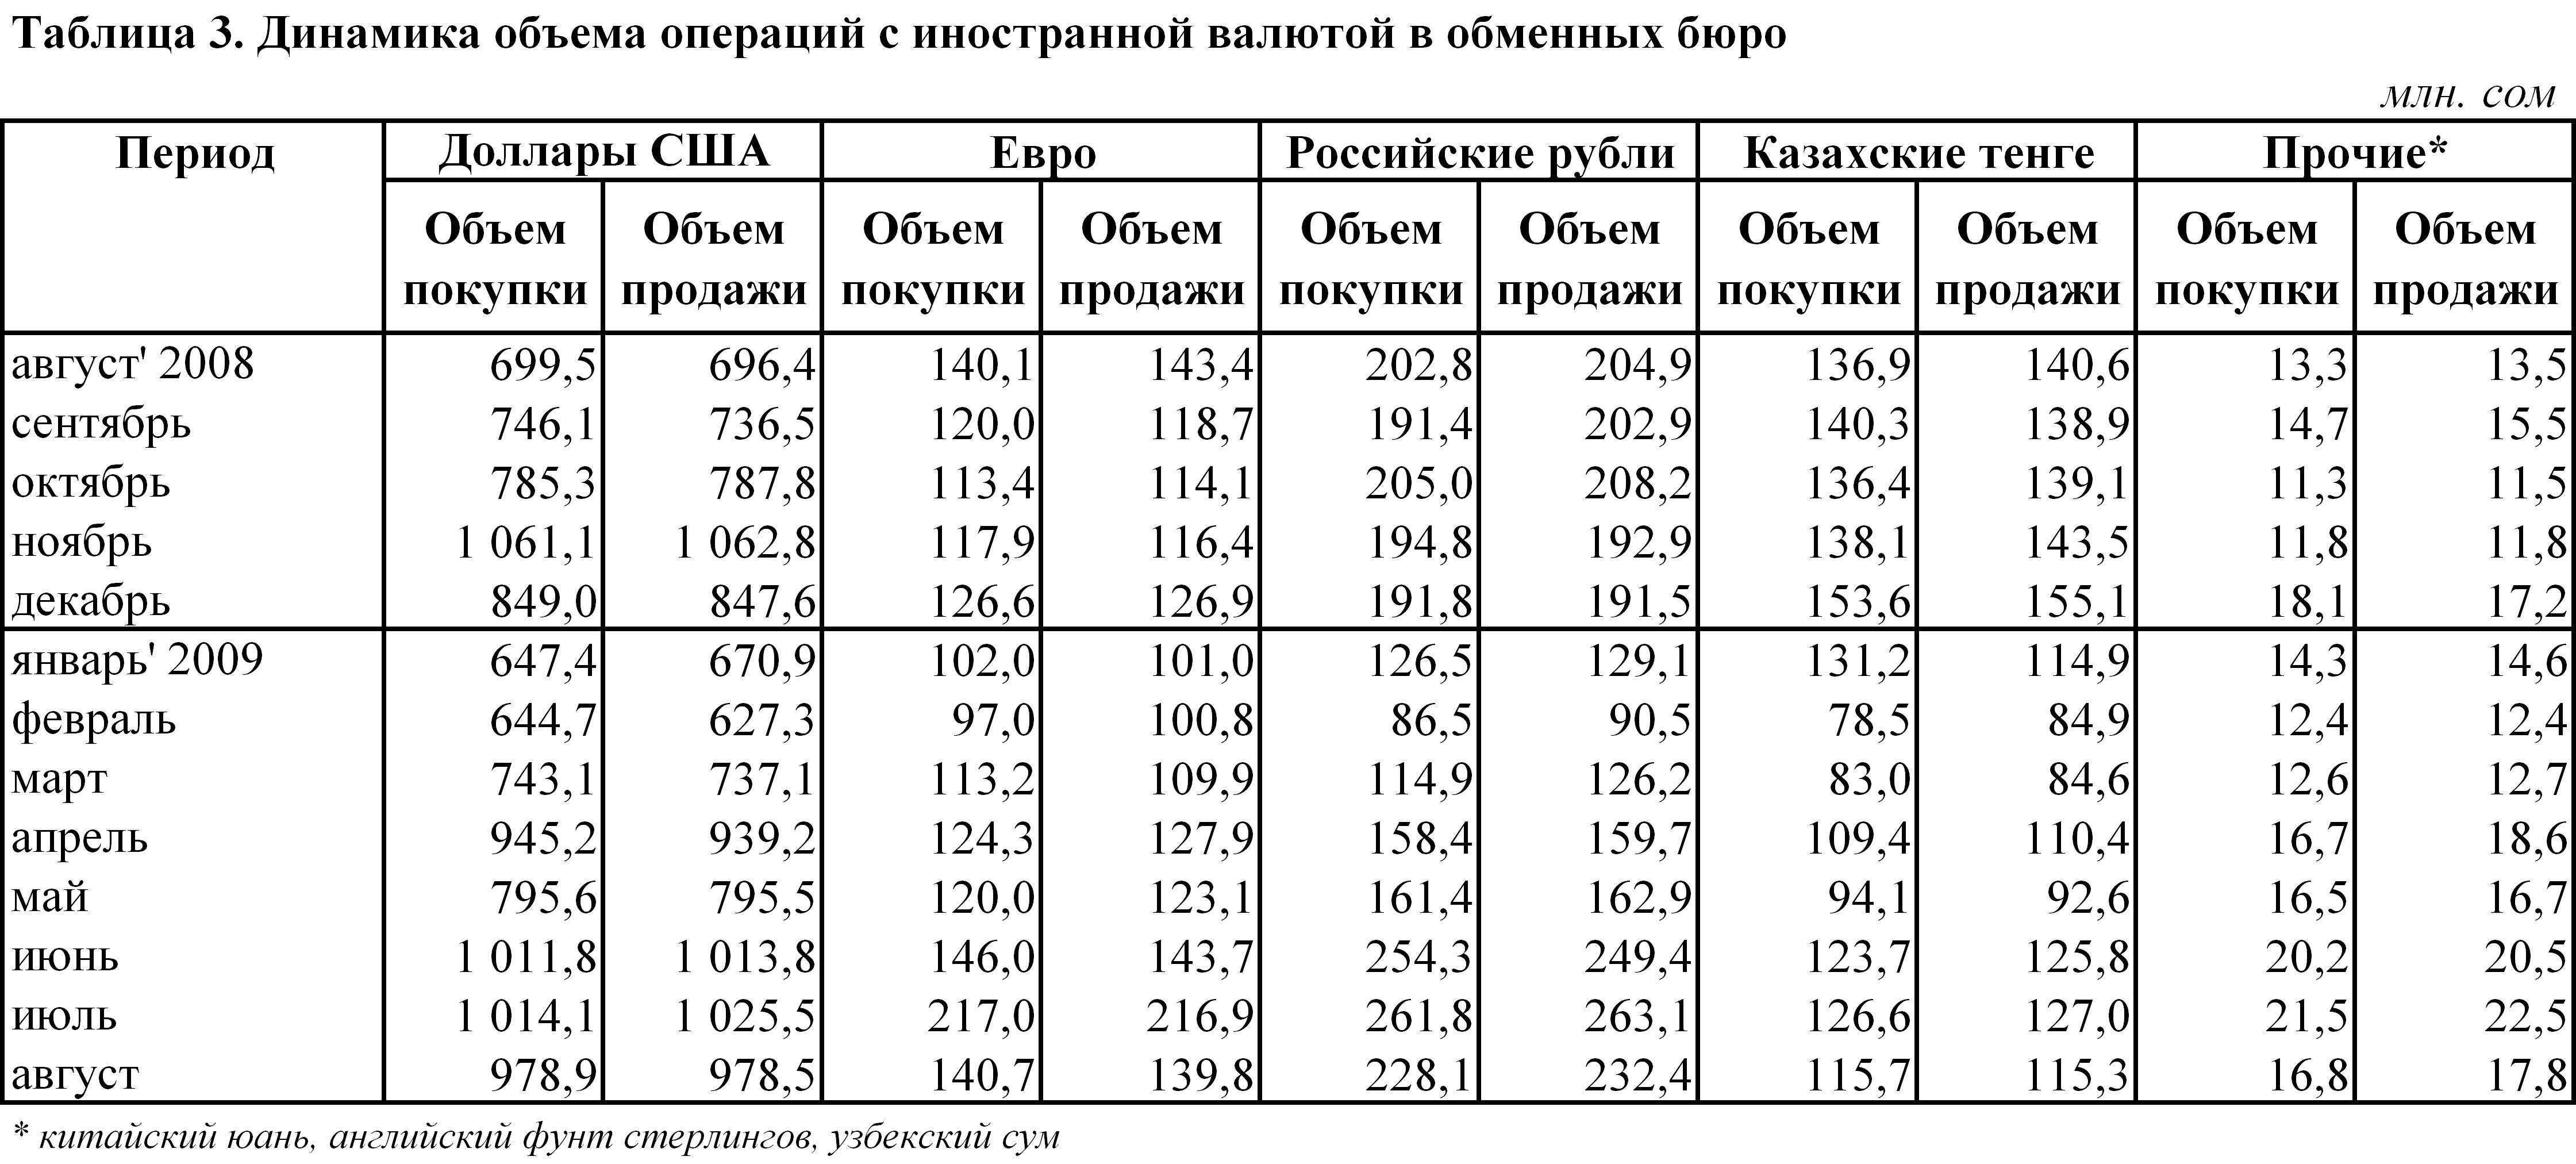 Официальный курс валют пмр